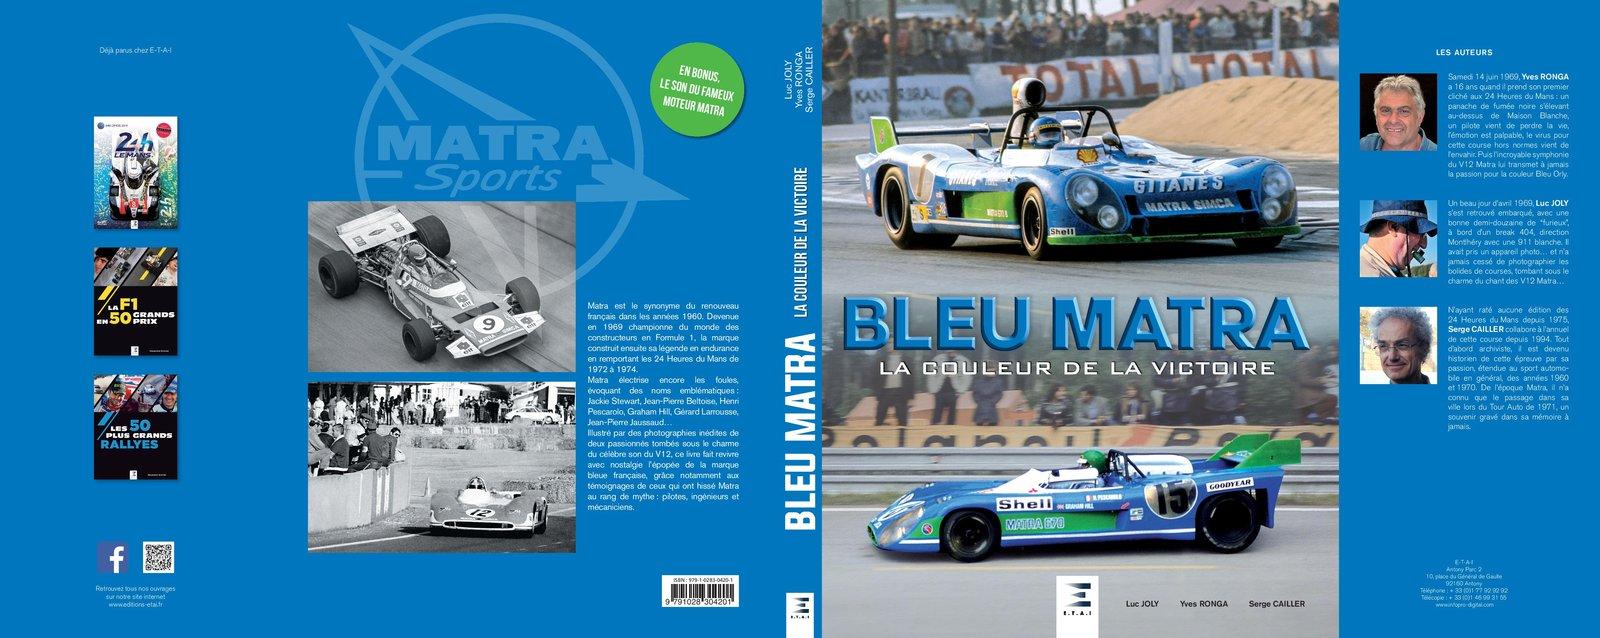 Bleu Matra_jaquette-page-001